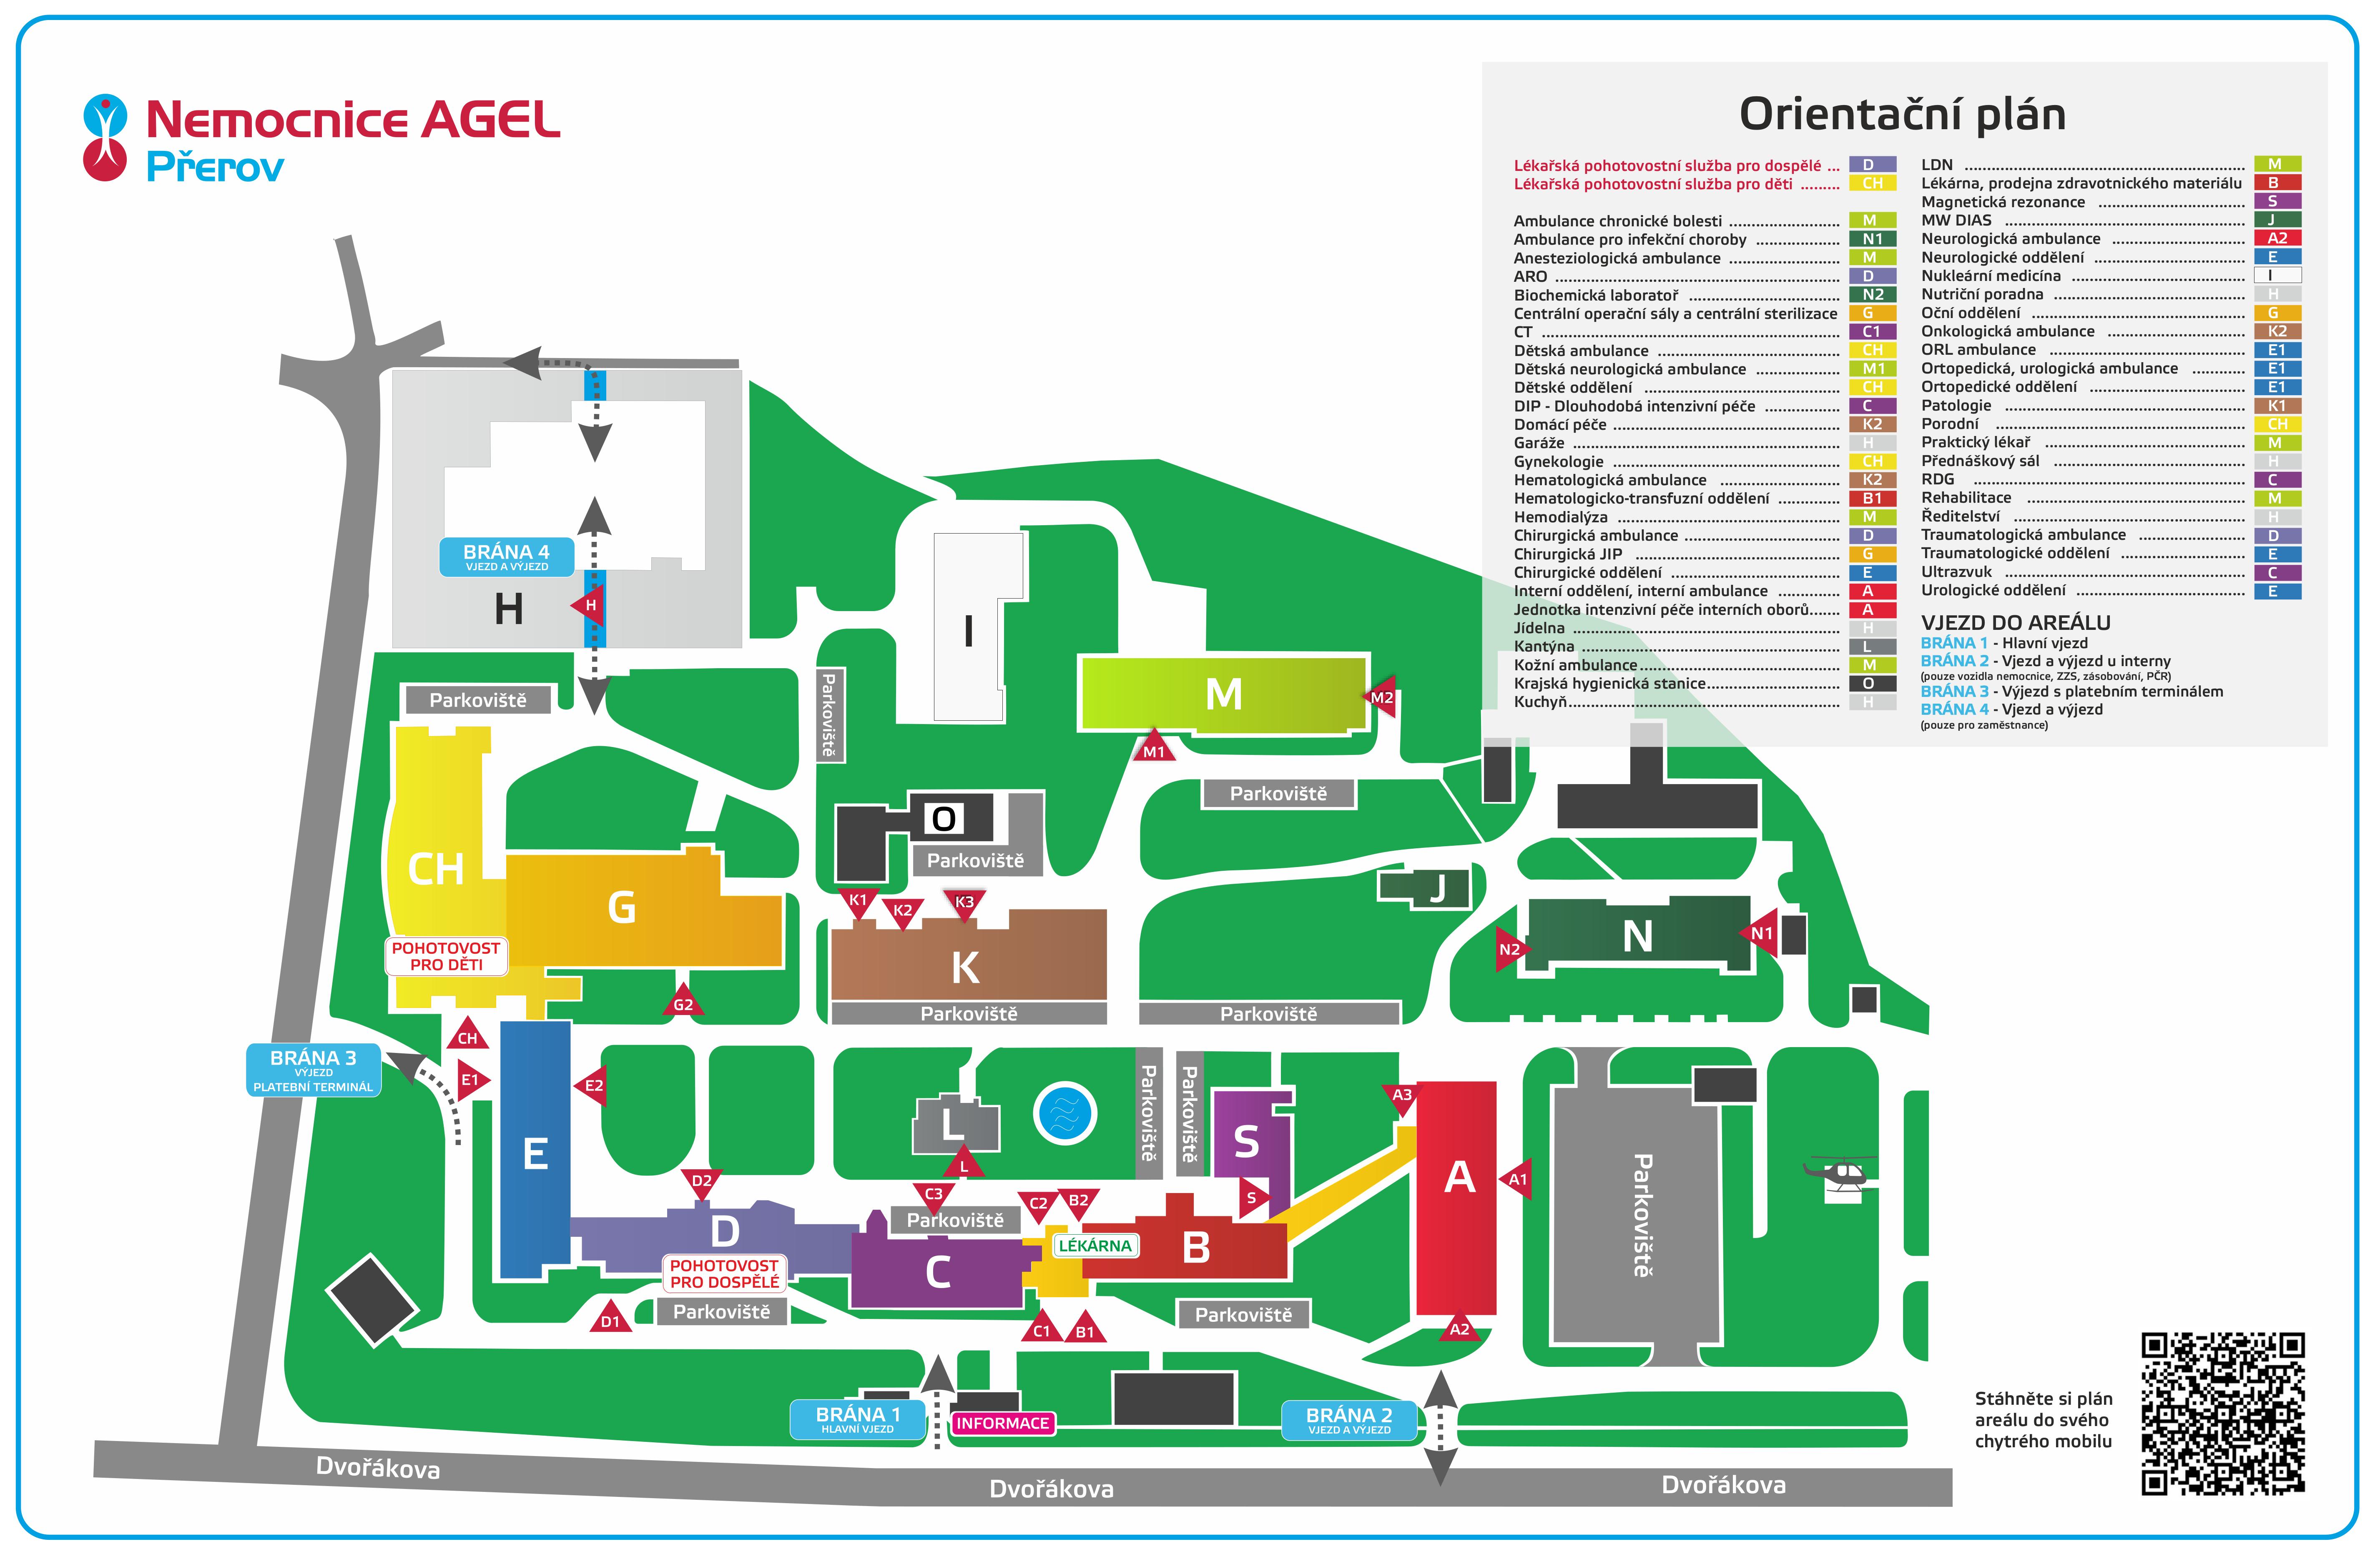 Orientacni Plan Nemocnice Nemocnice Prerov